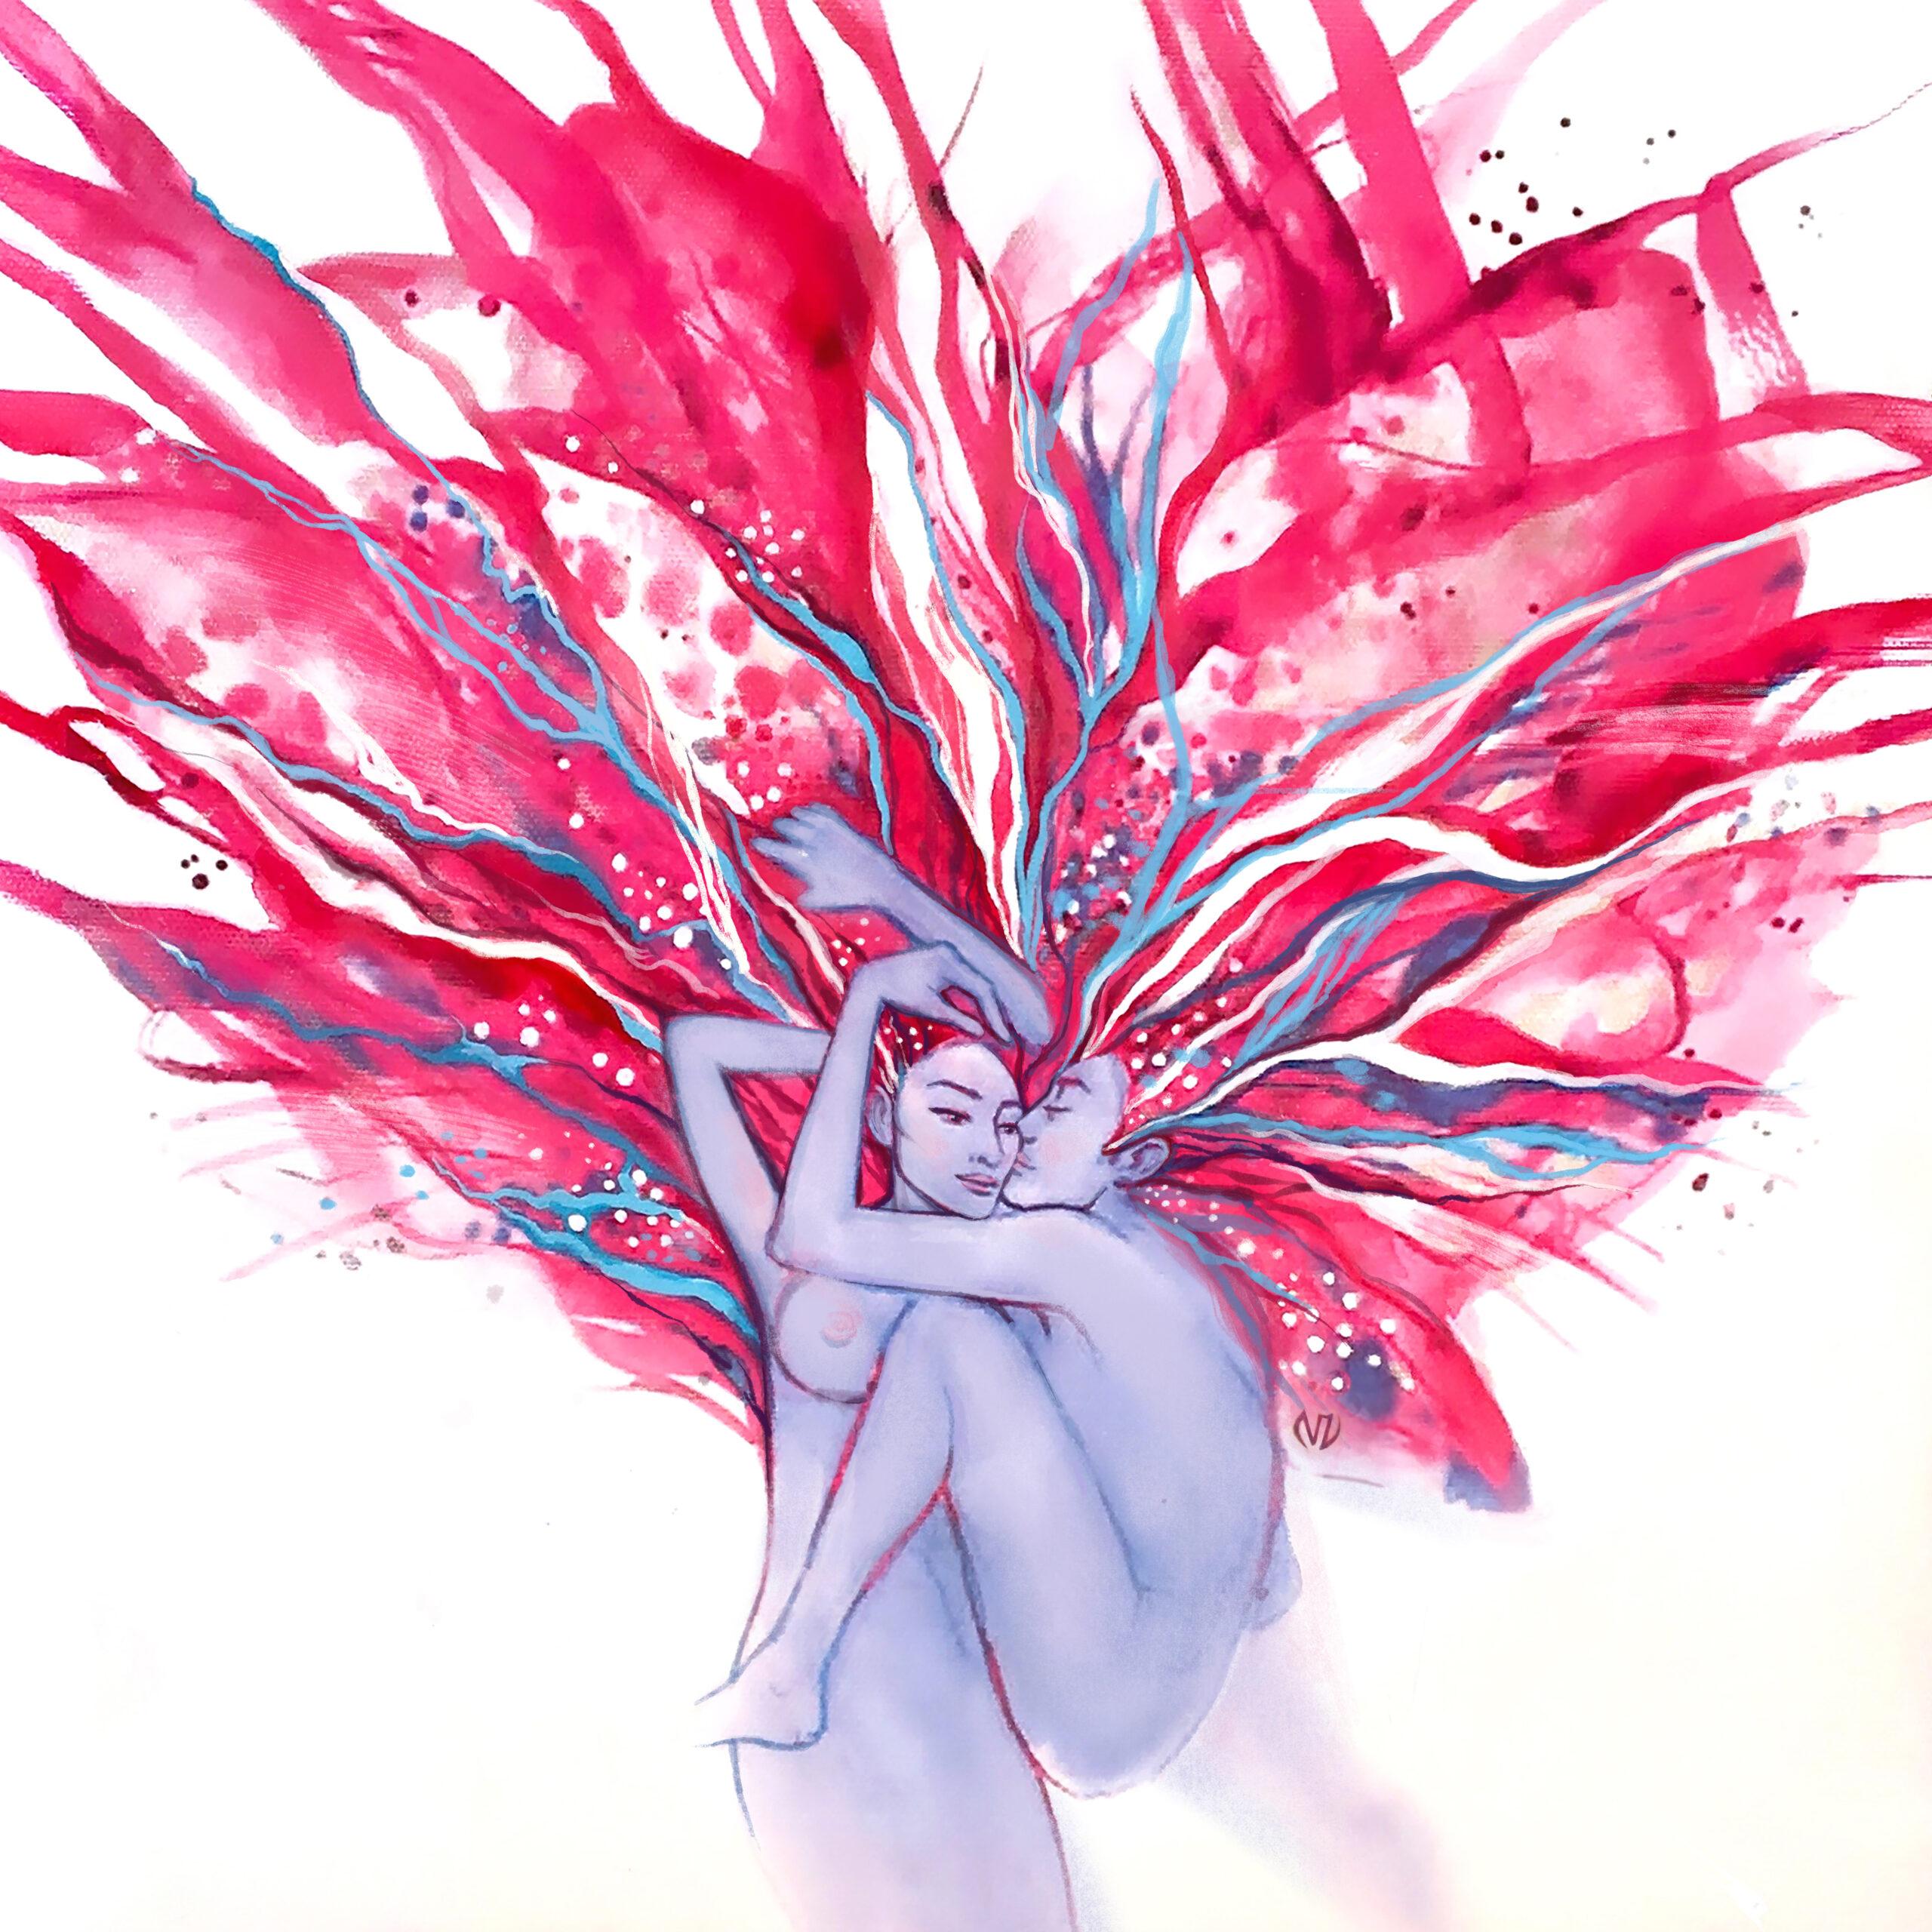 50x50-RuspberryKiss-ViorikaZagorowska-ArtForSale